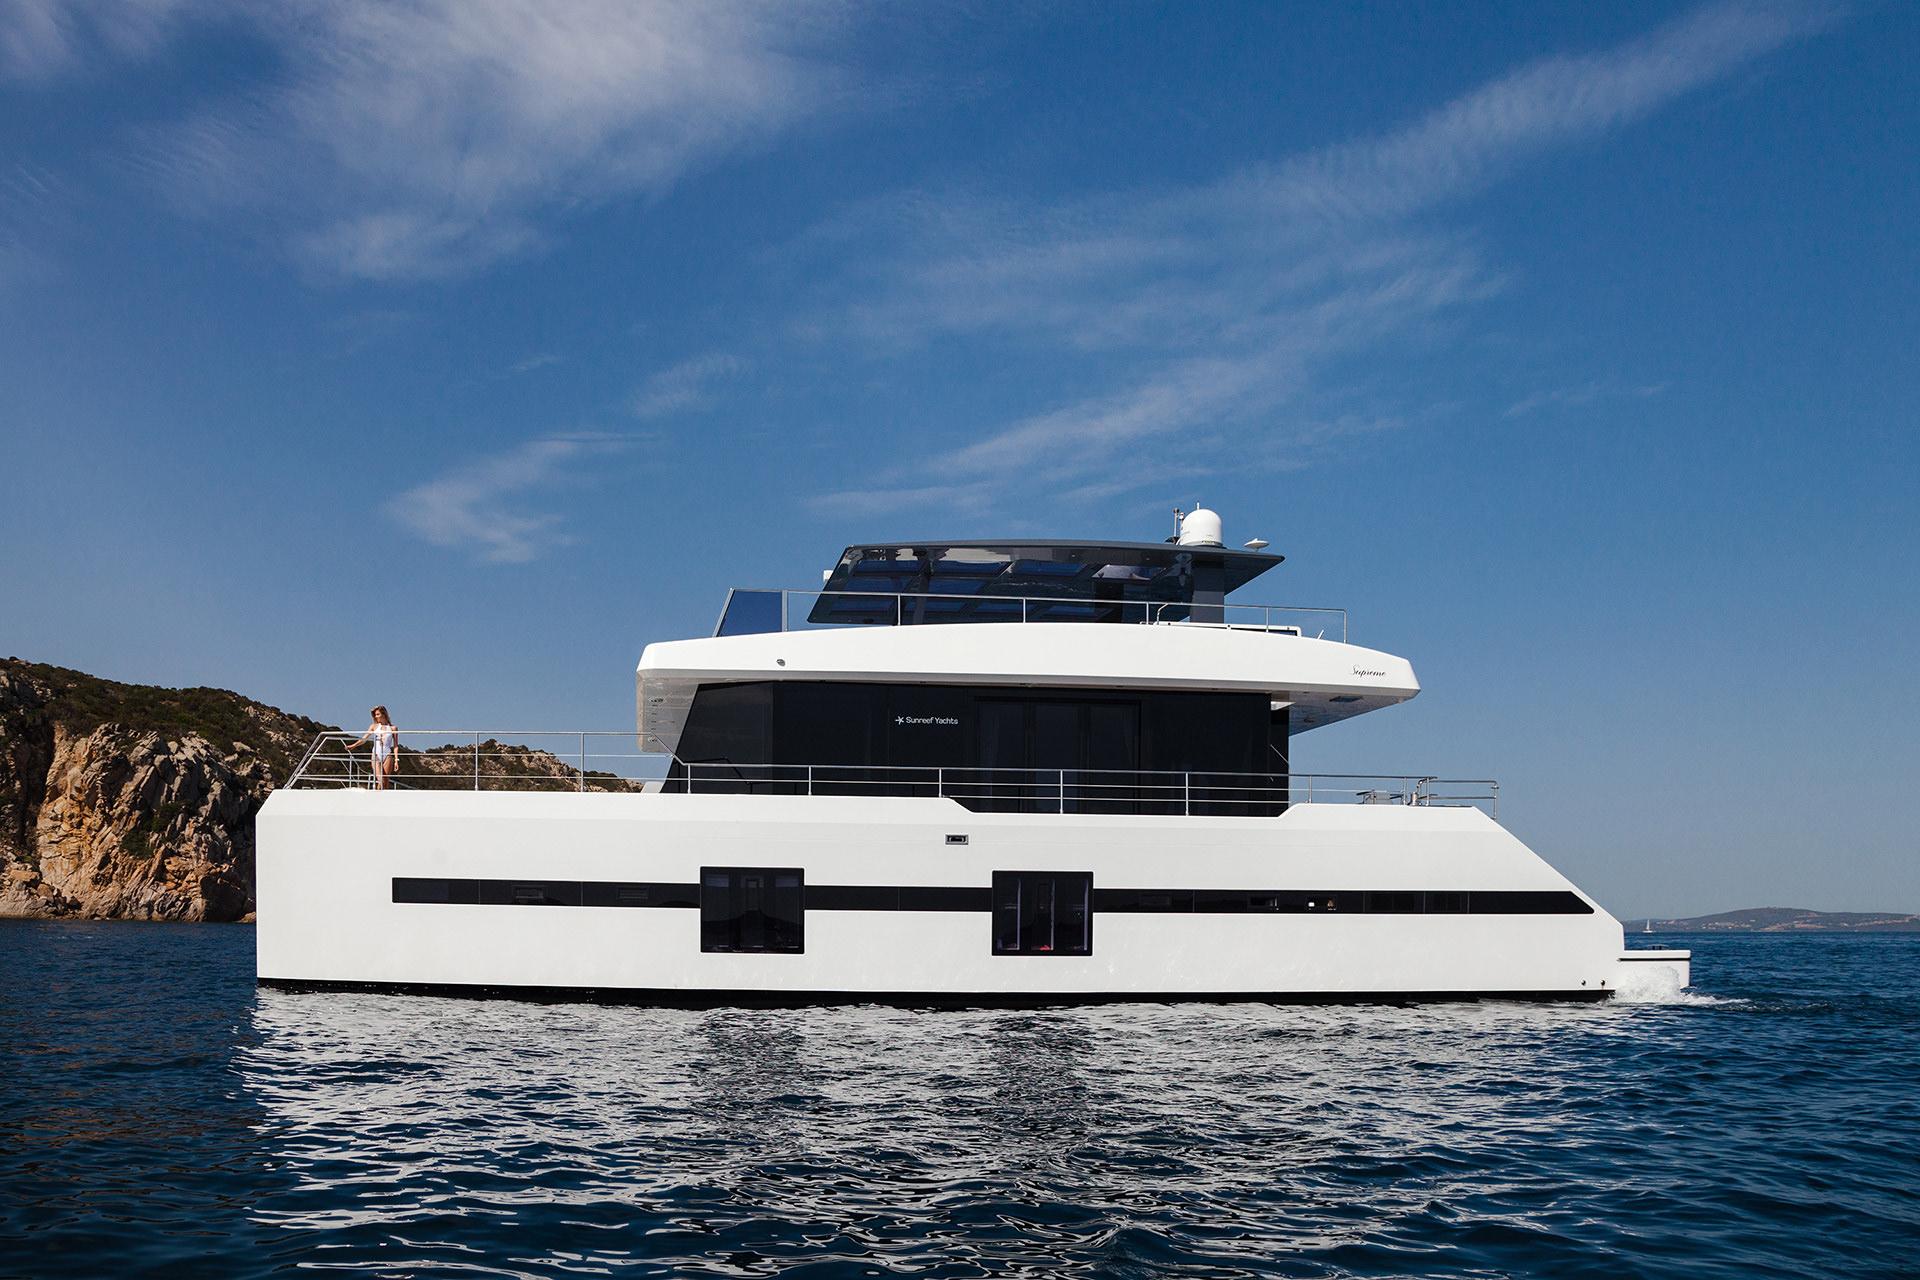 Sunreef Supreme 68 Power - Sunreef Yachts